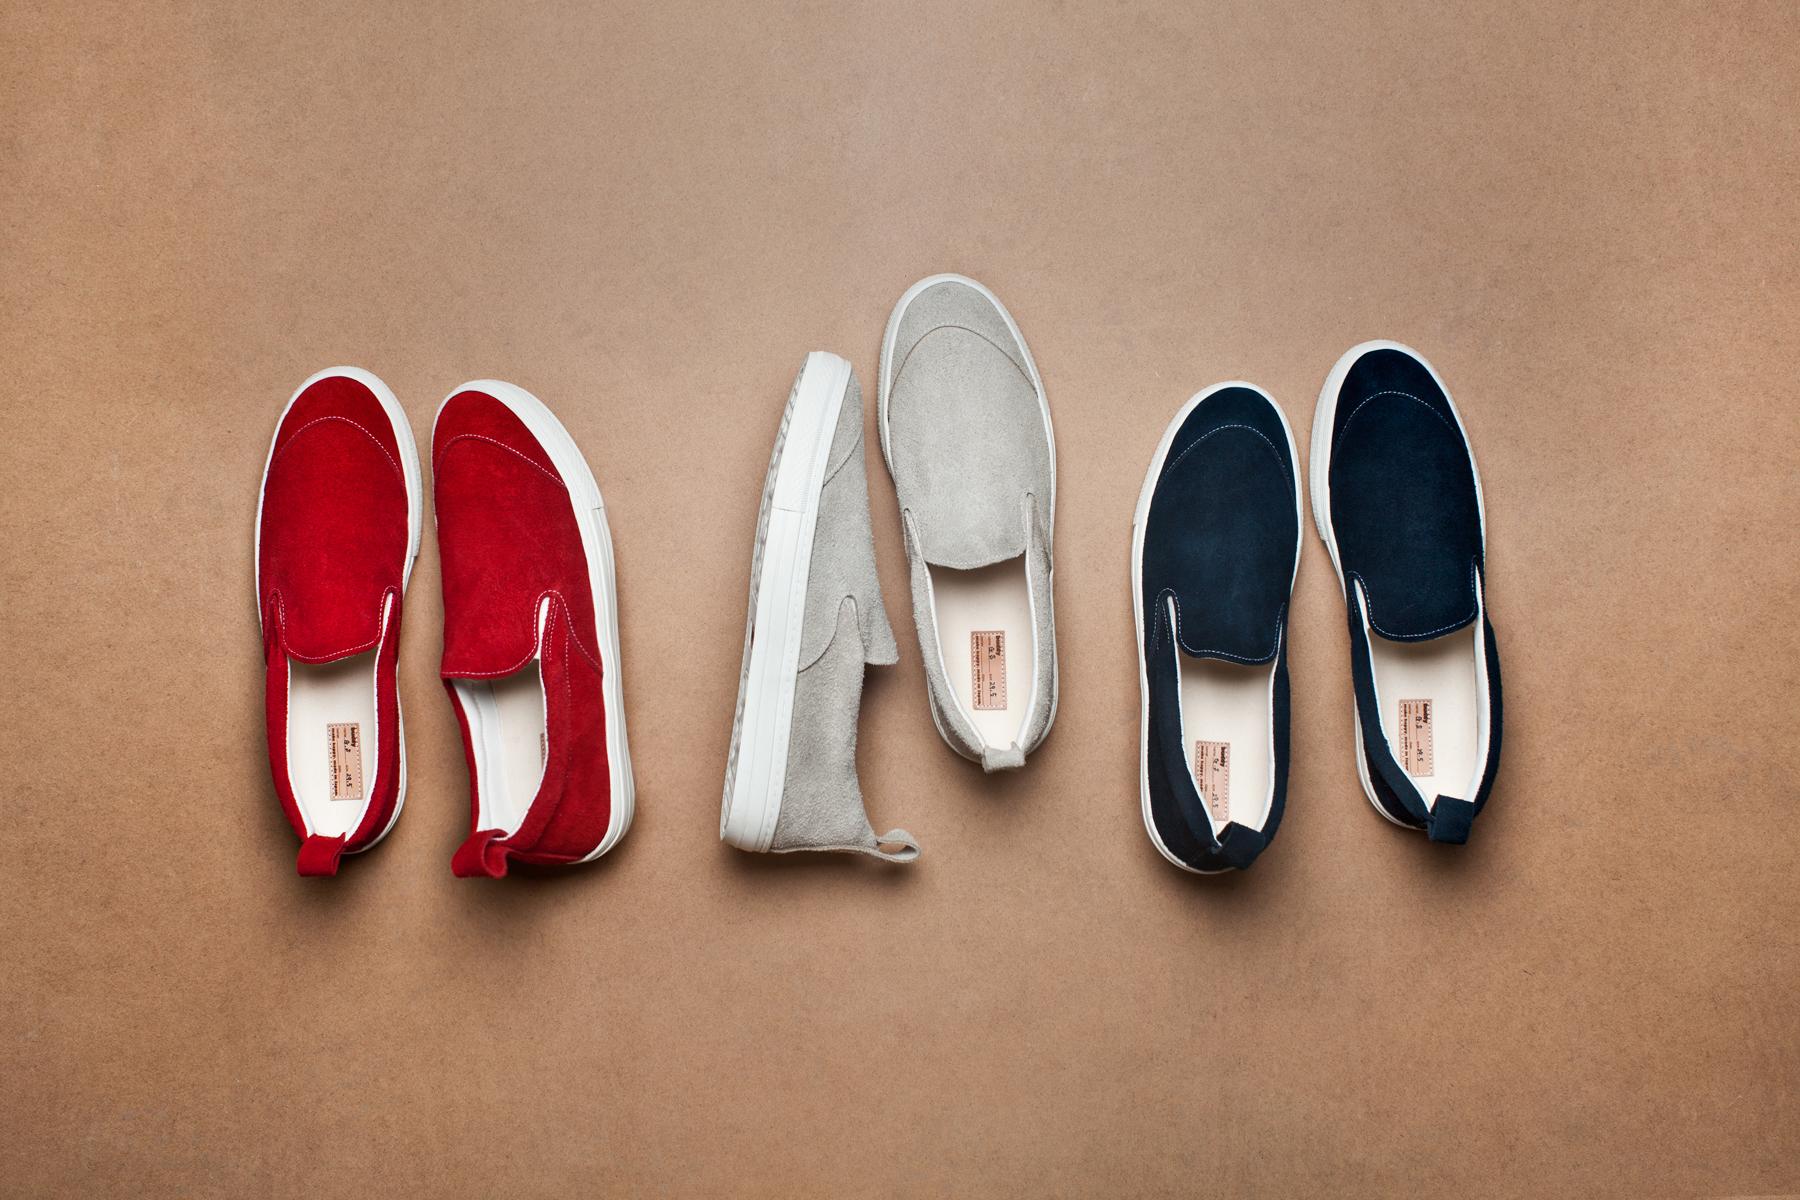 Buddy 2014 German Shepherd Slip-on Sneaker Collection